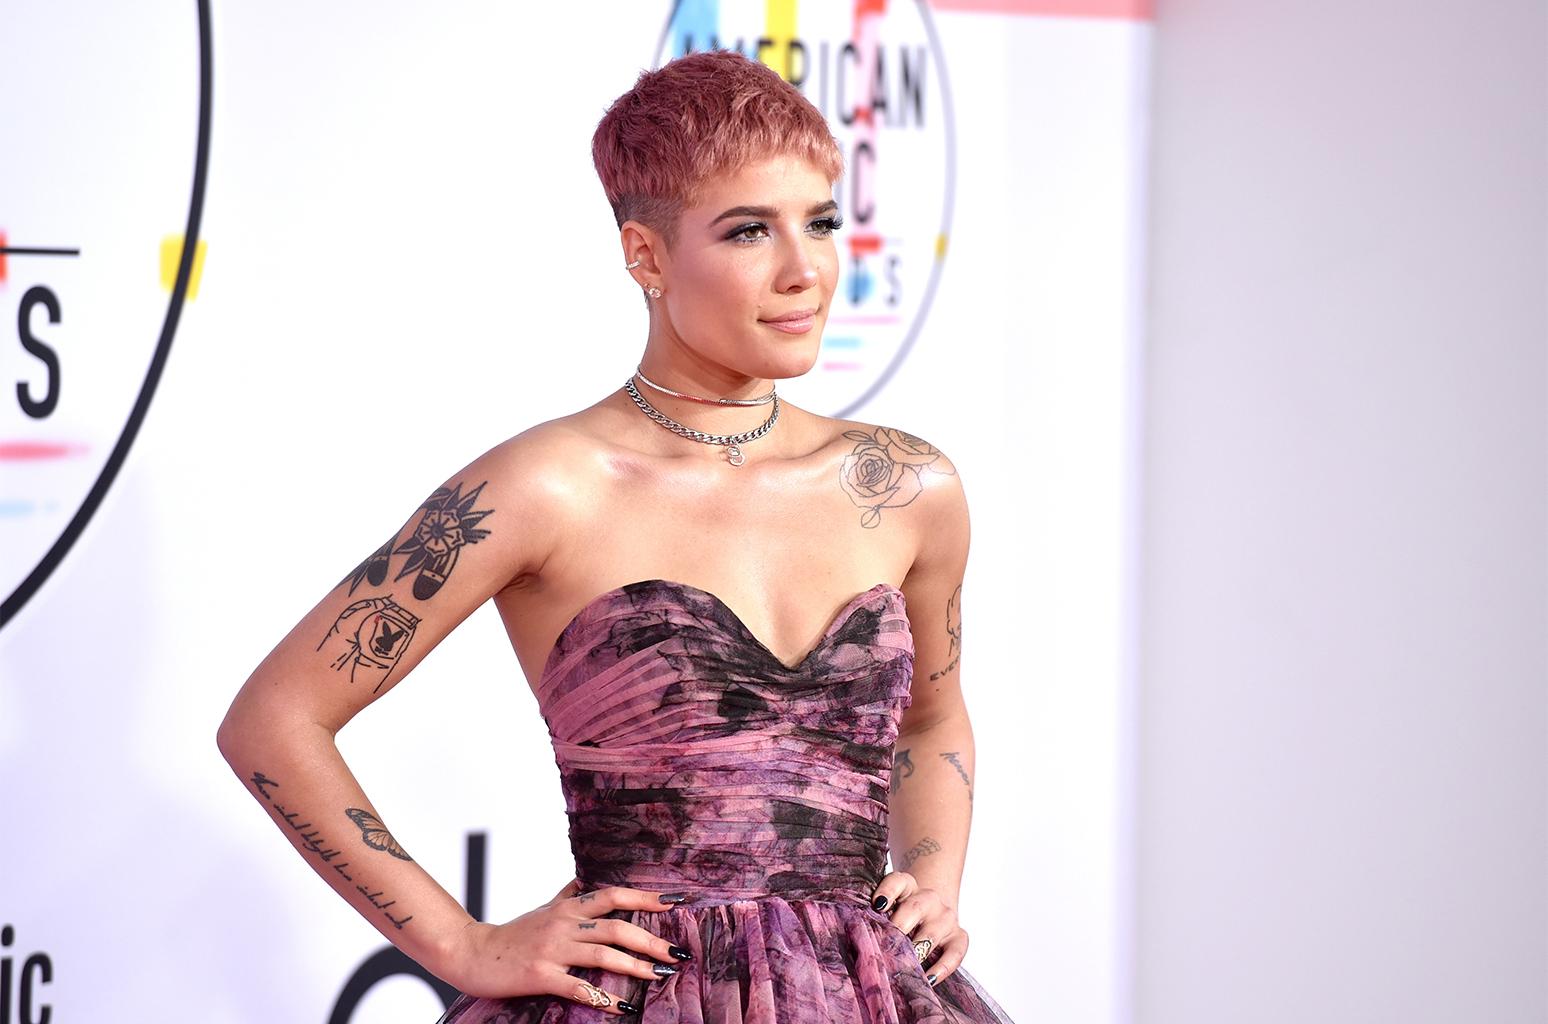 Actor Porno Gay Brasileño Cara Tatuada https://www.billboard/articles/news/8487640/halsey